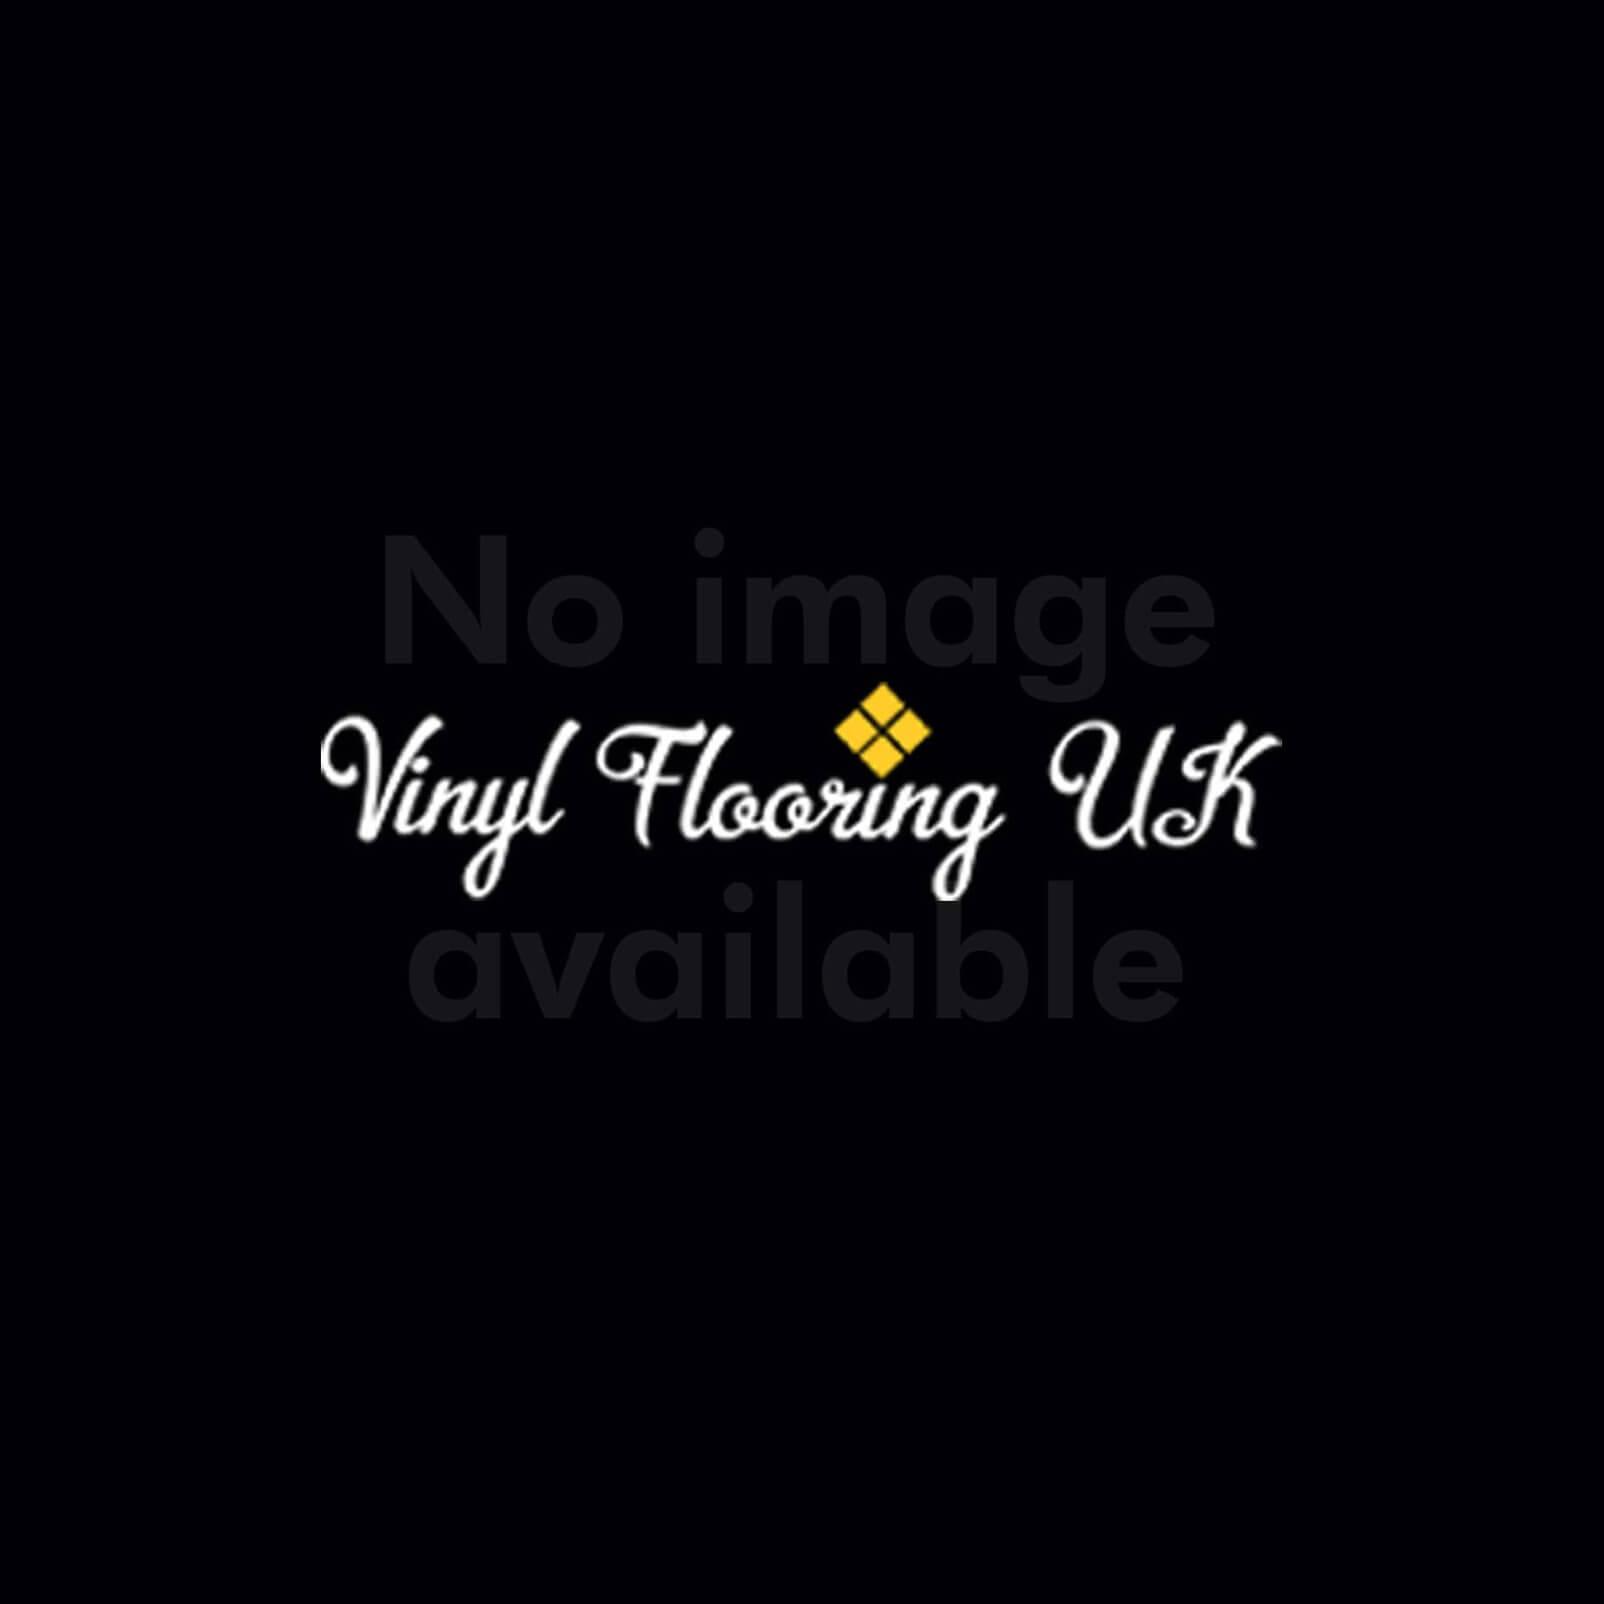 0528 Dark High Quality Vinyl Flooring